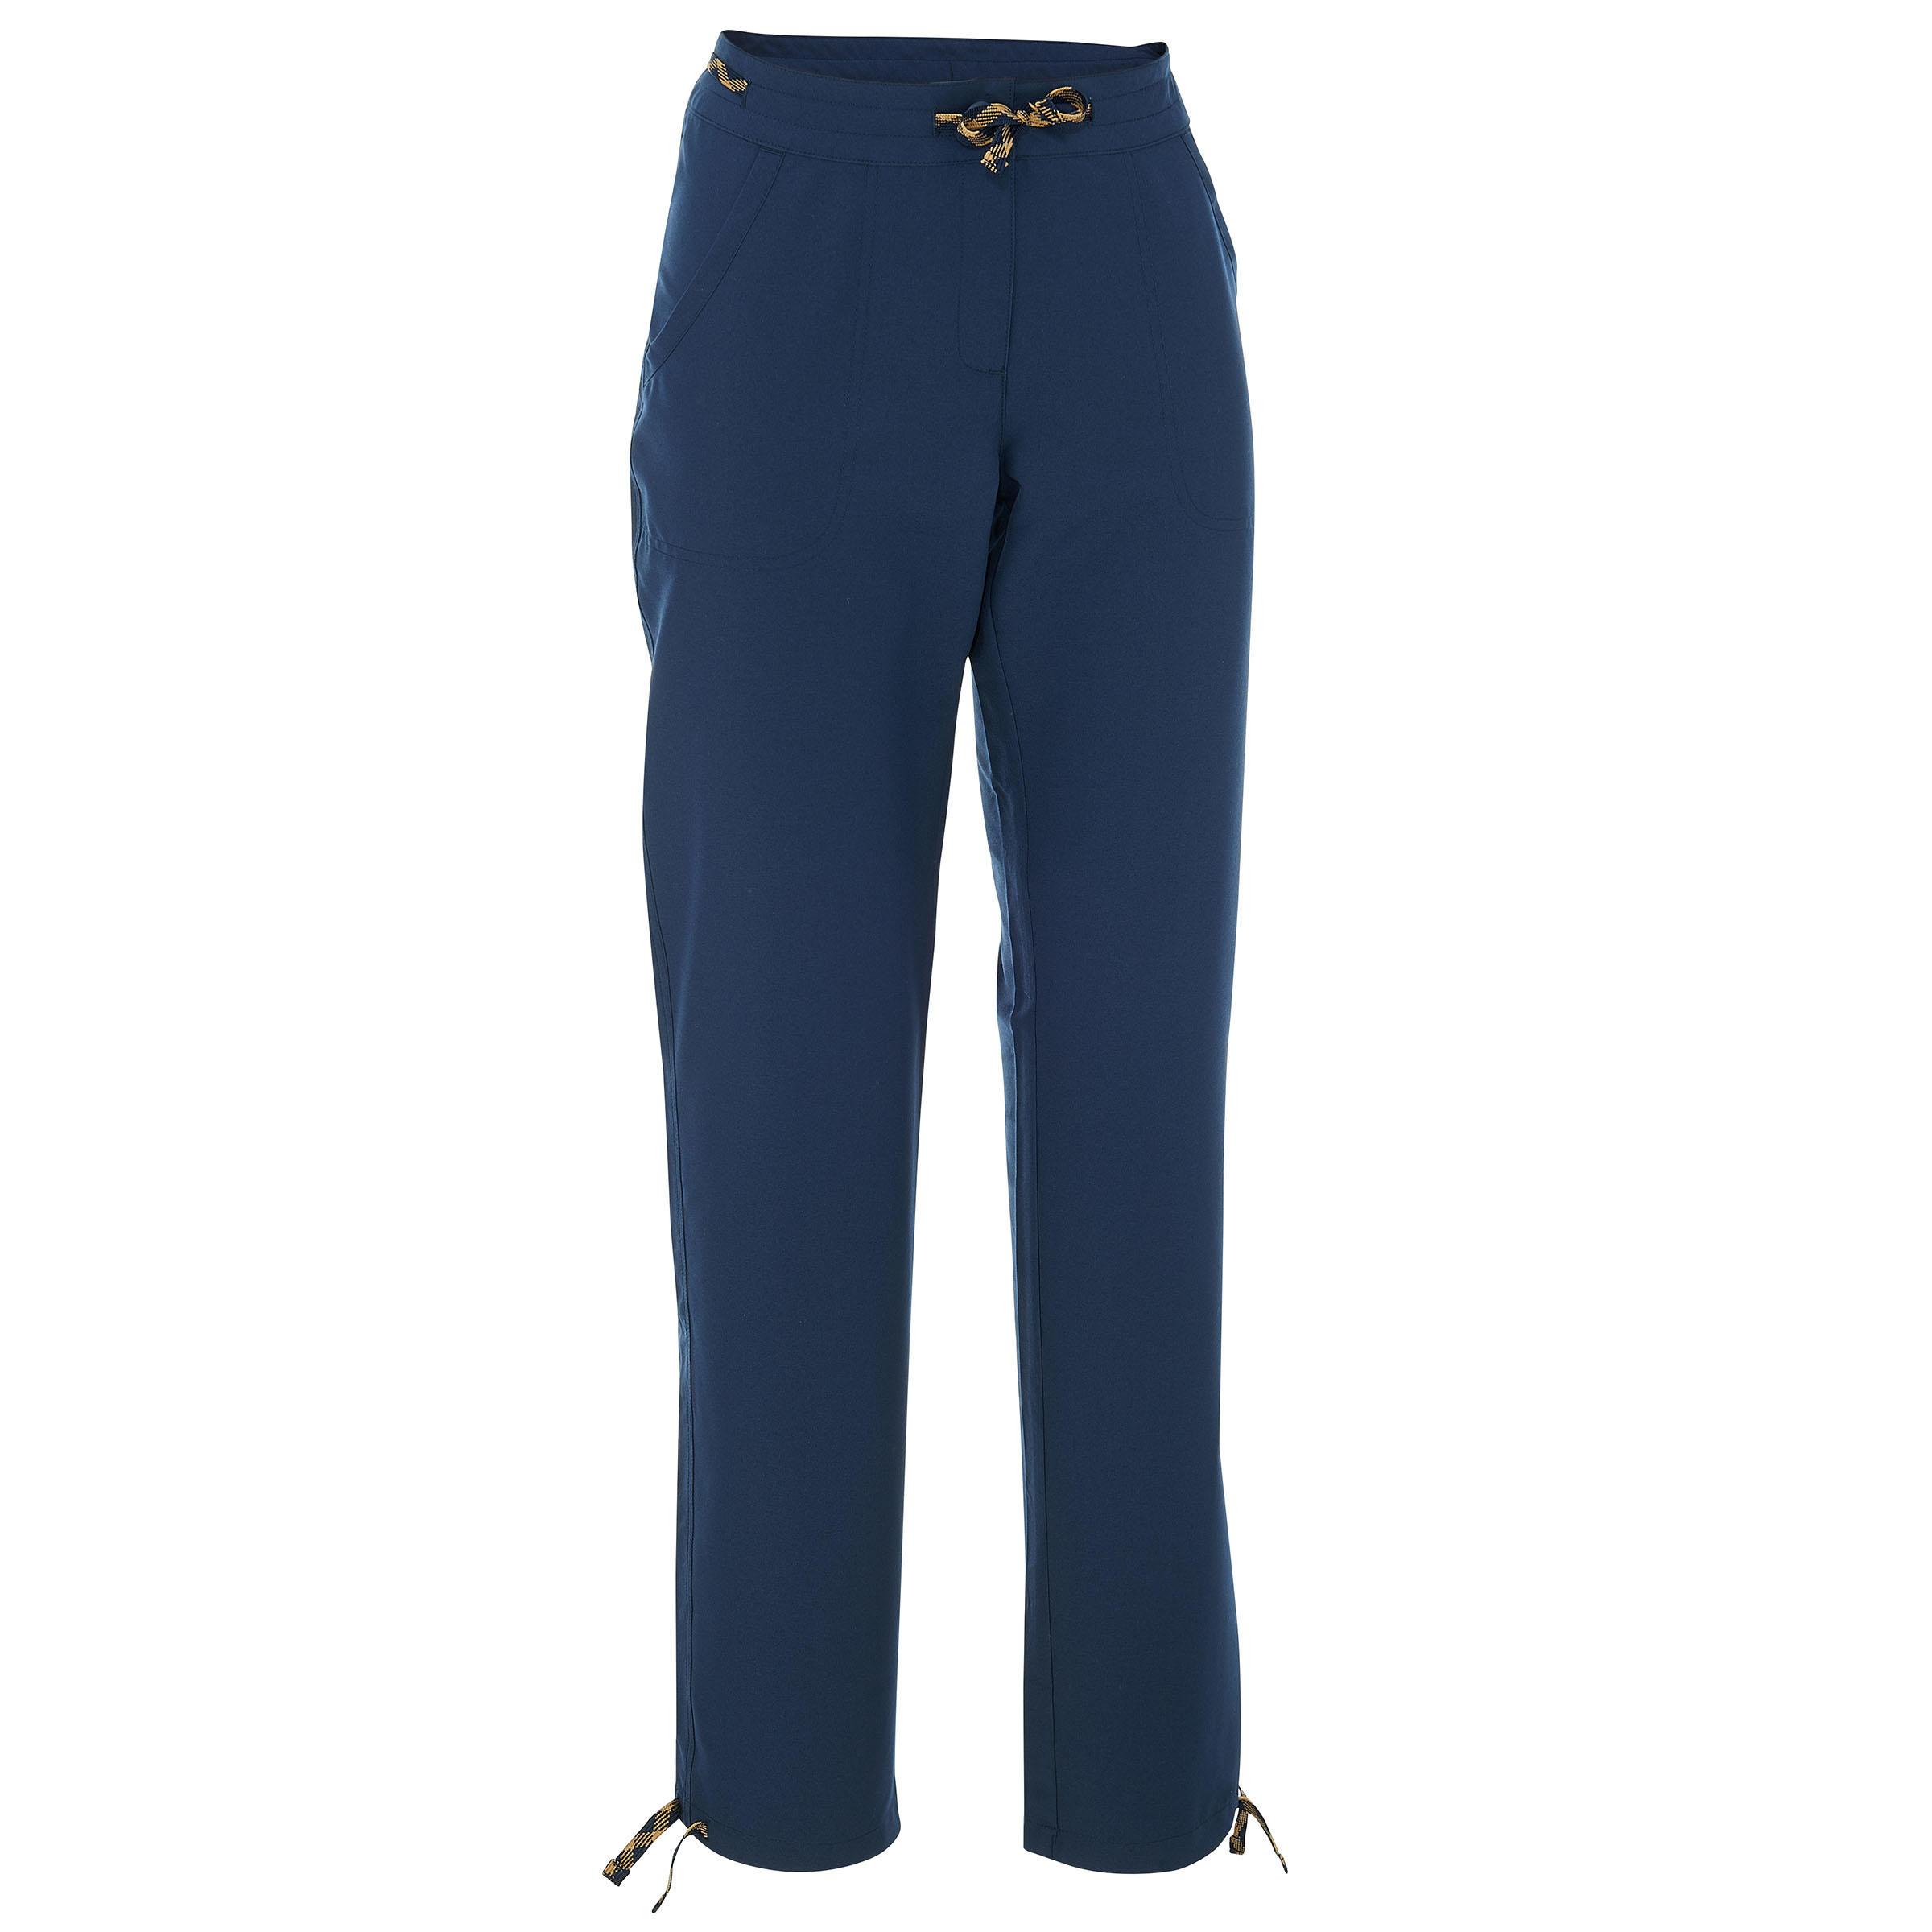 b62ced58e6be Comprar Pantalones de Mujer Deportivos online | Decathlon